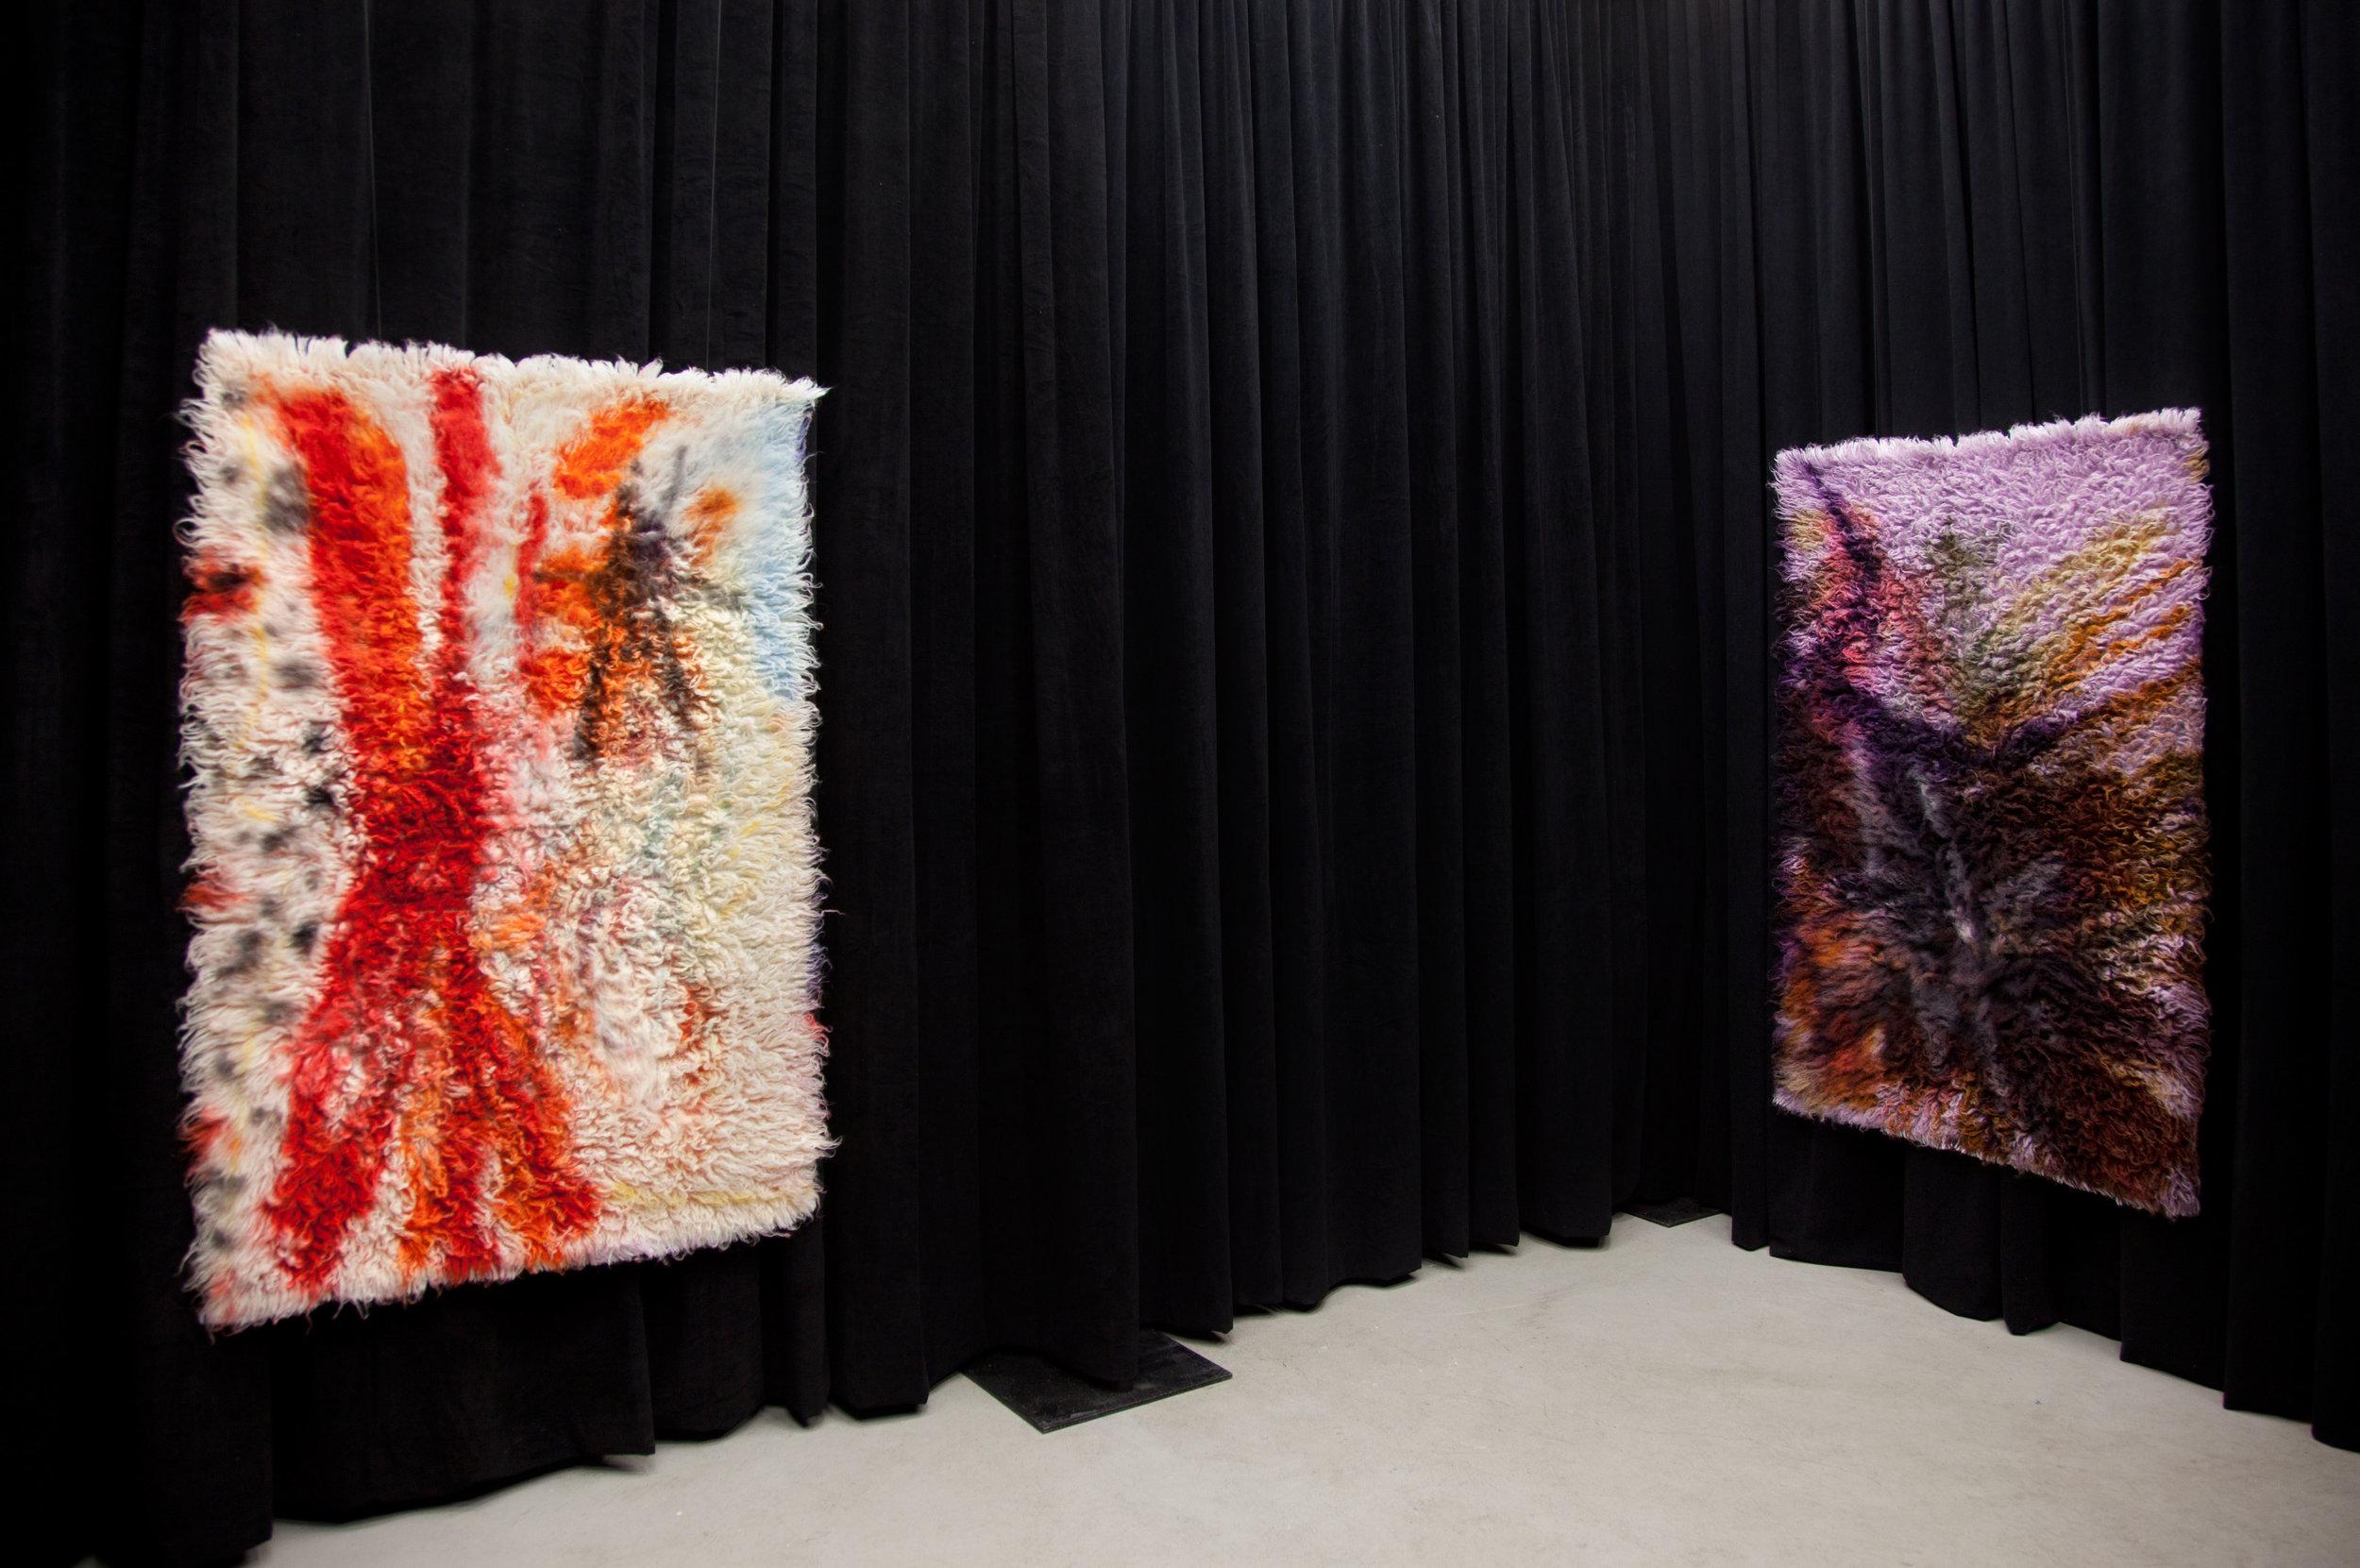 (Left)  Sticks and Stones , 2017, wool rug, acid dye, hairspray, chalk. (Right)  Straw and Clay, 2017,  wool rug, acid dye, hairspray, chalk.